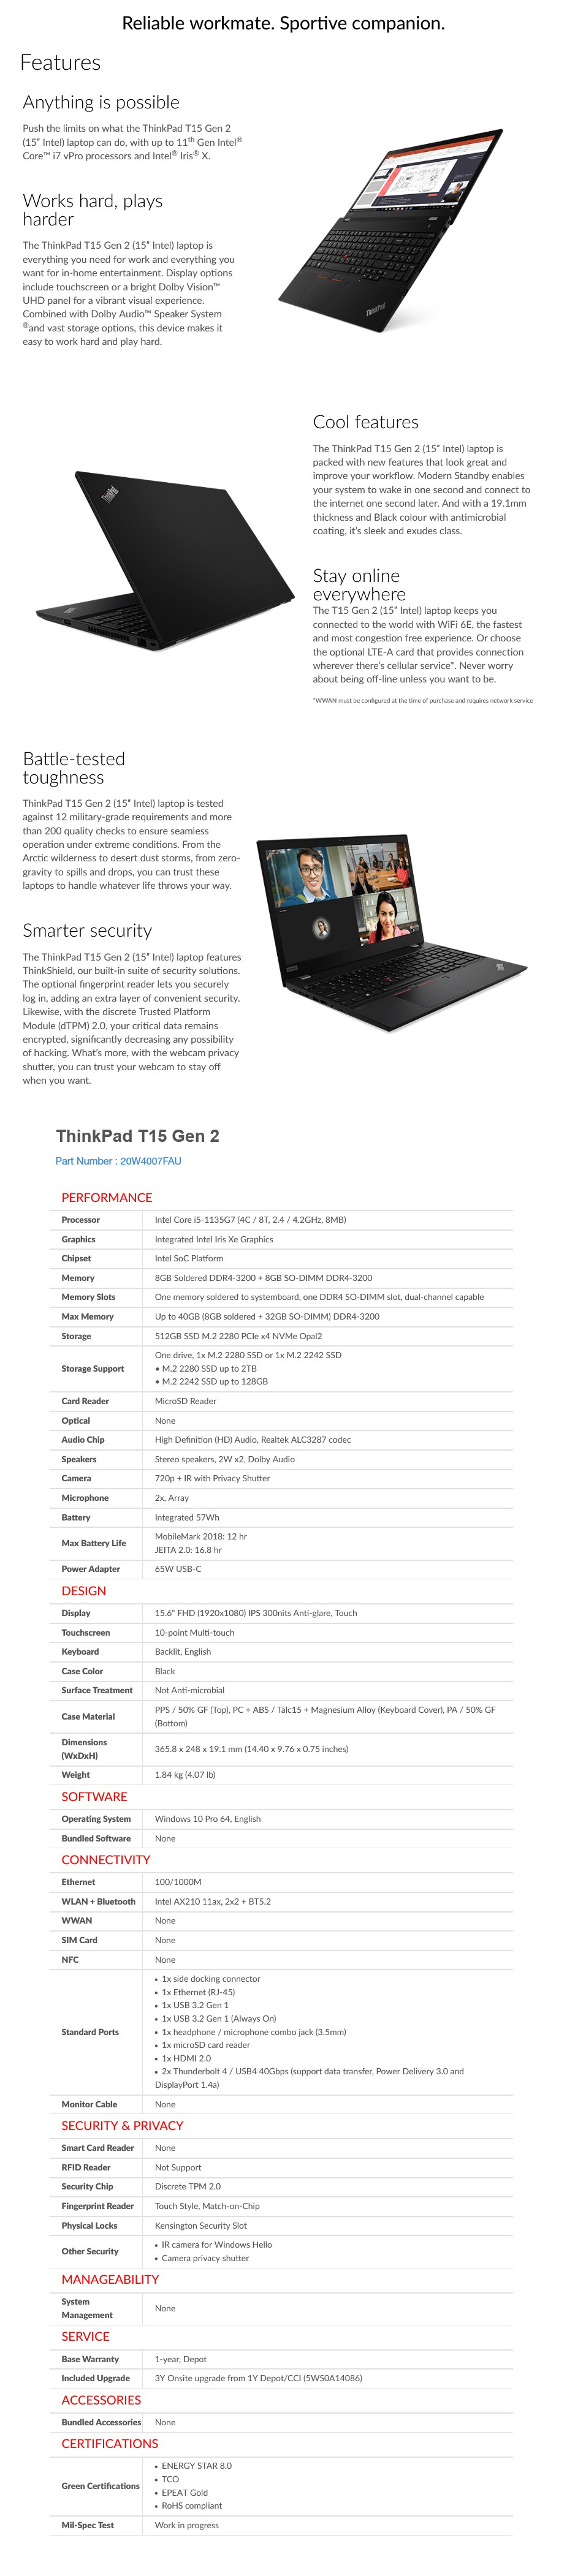 lenovo-thinkpad-t15-gen-2-156-laptop-i51135g7-16gb-512gb-w10p-touch-ac44497-9.jpg